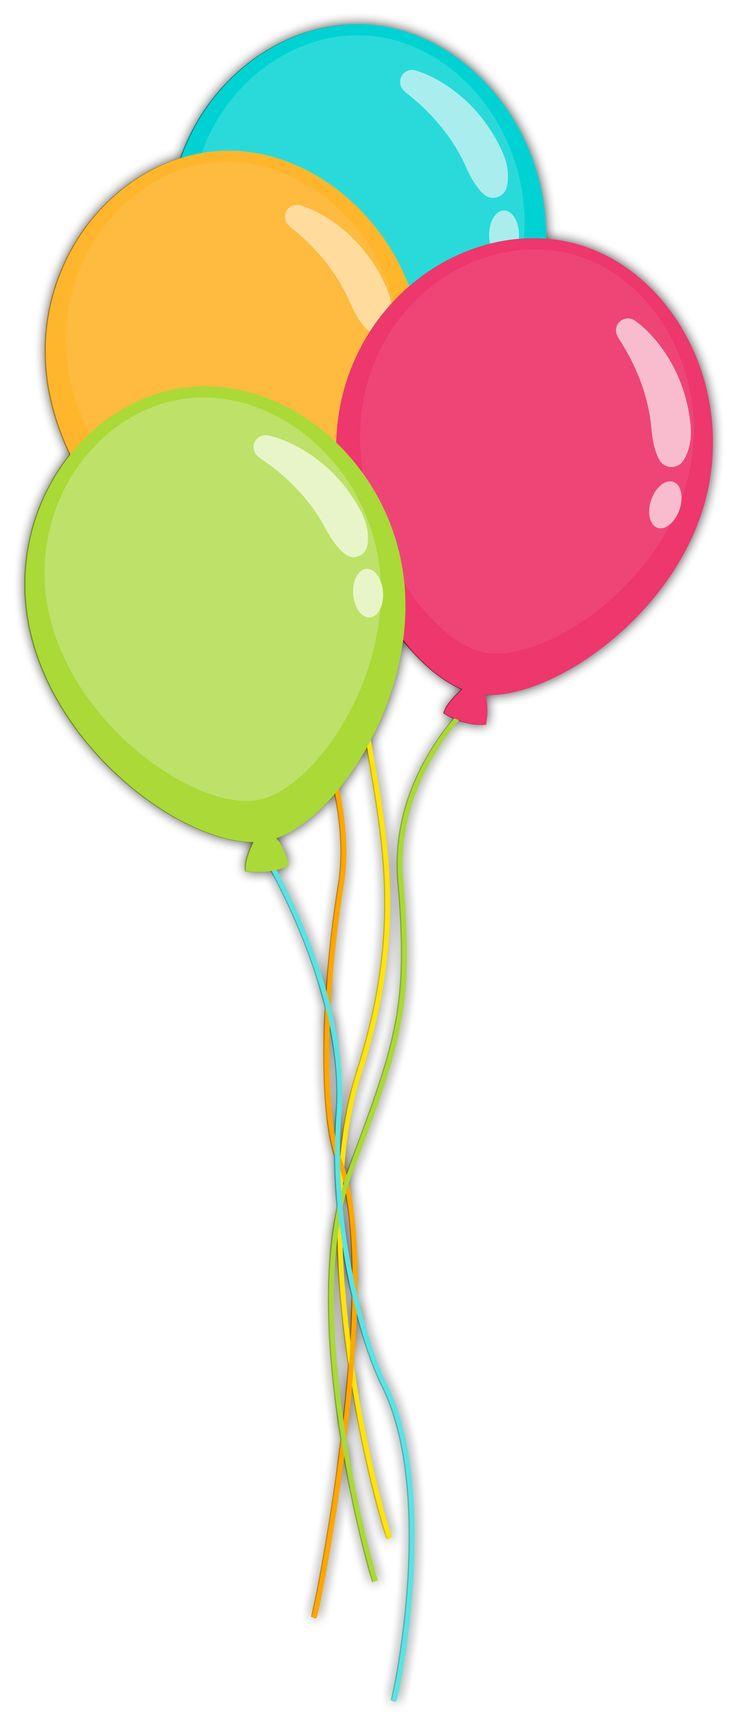 For balloons gclipart com. Balloon clipart cartoon